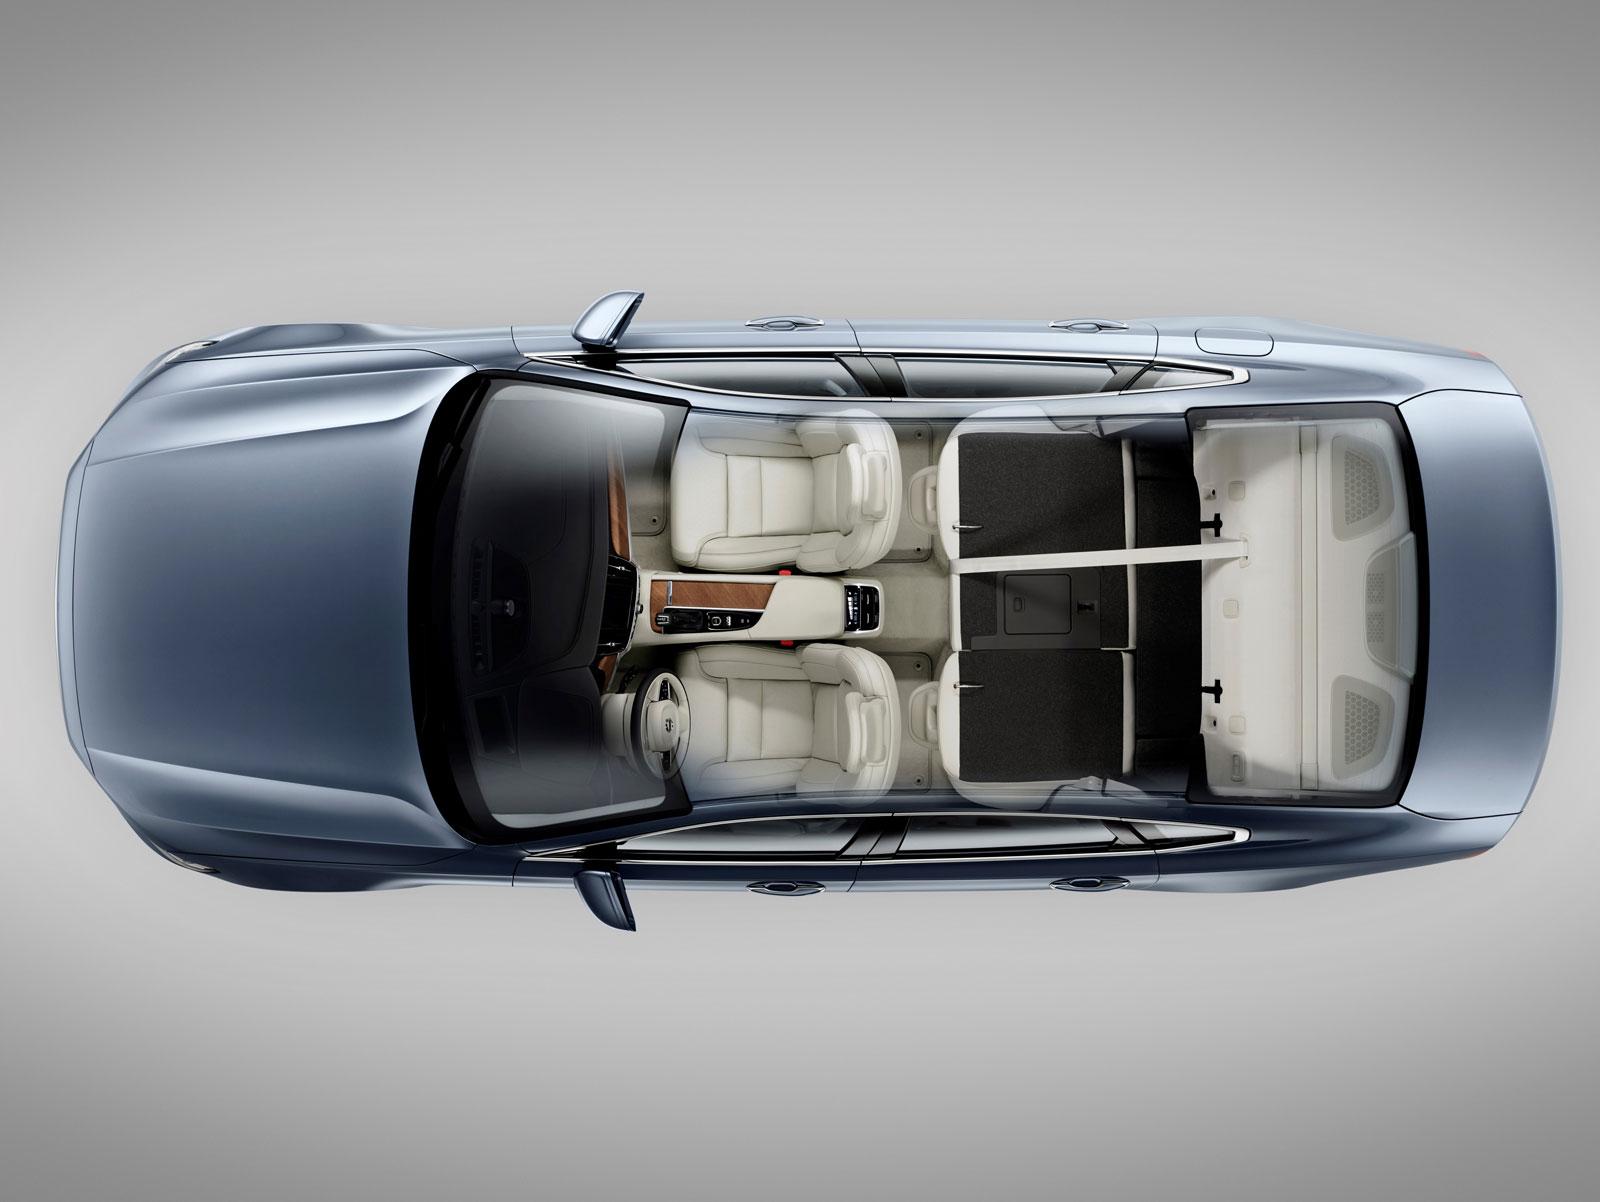 volvo s90 interior top view car body design. Black Bedroom Furniture Sets. Home Design Ideas